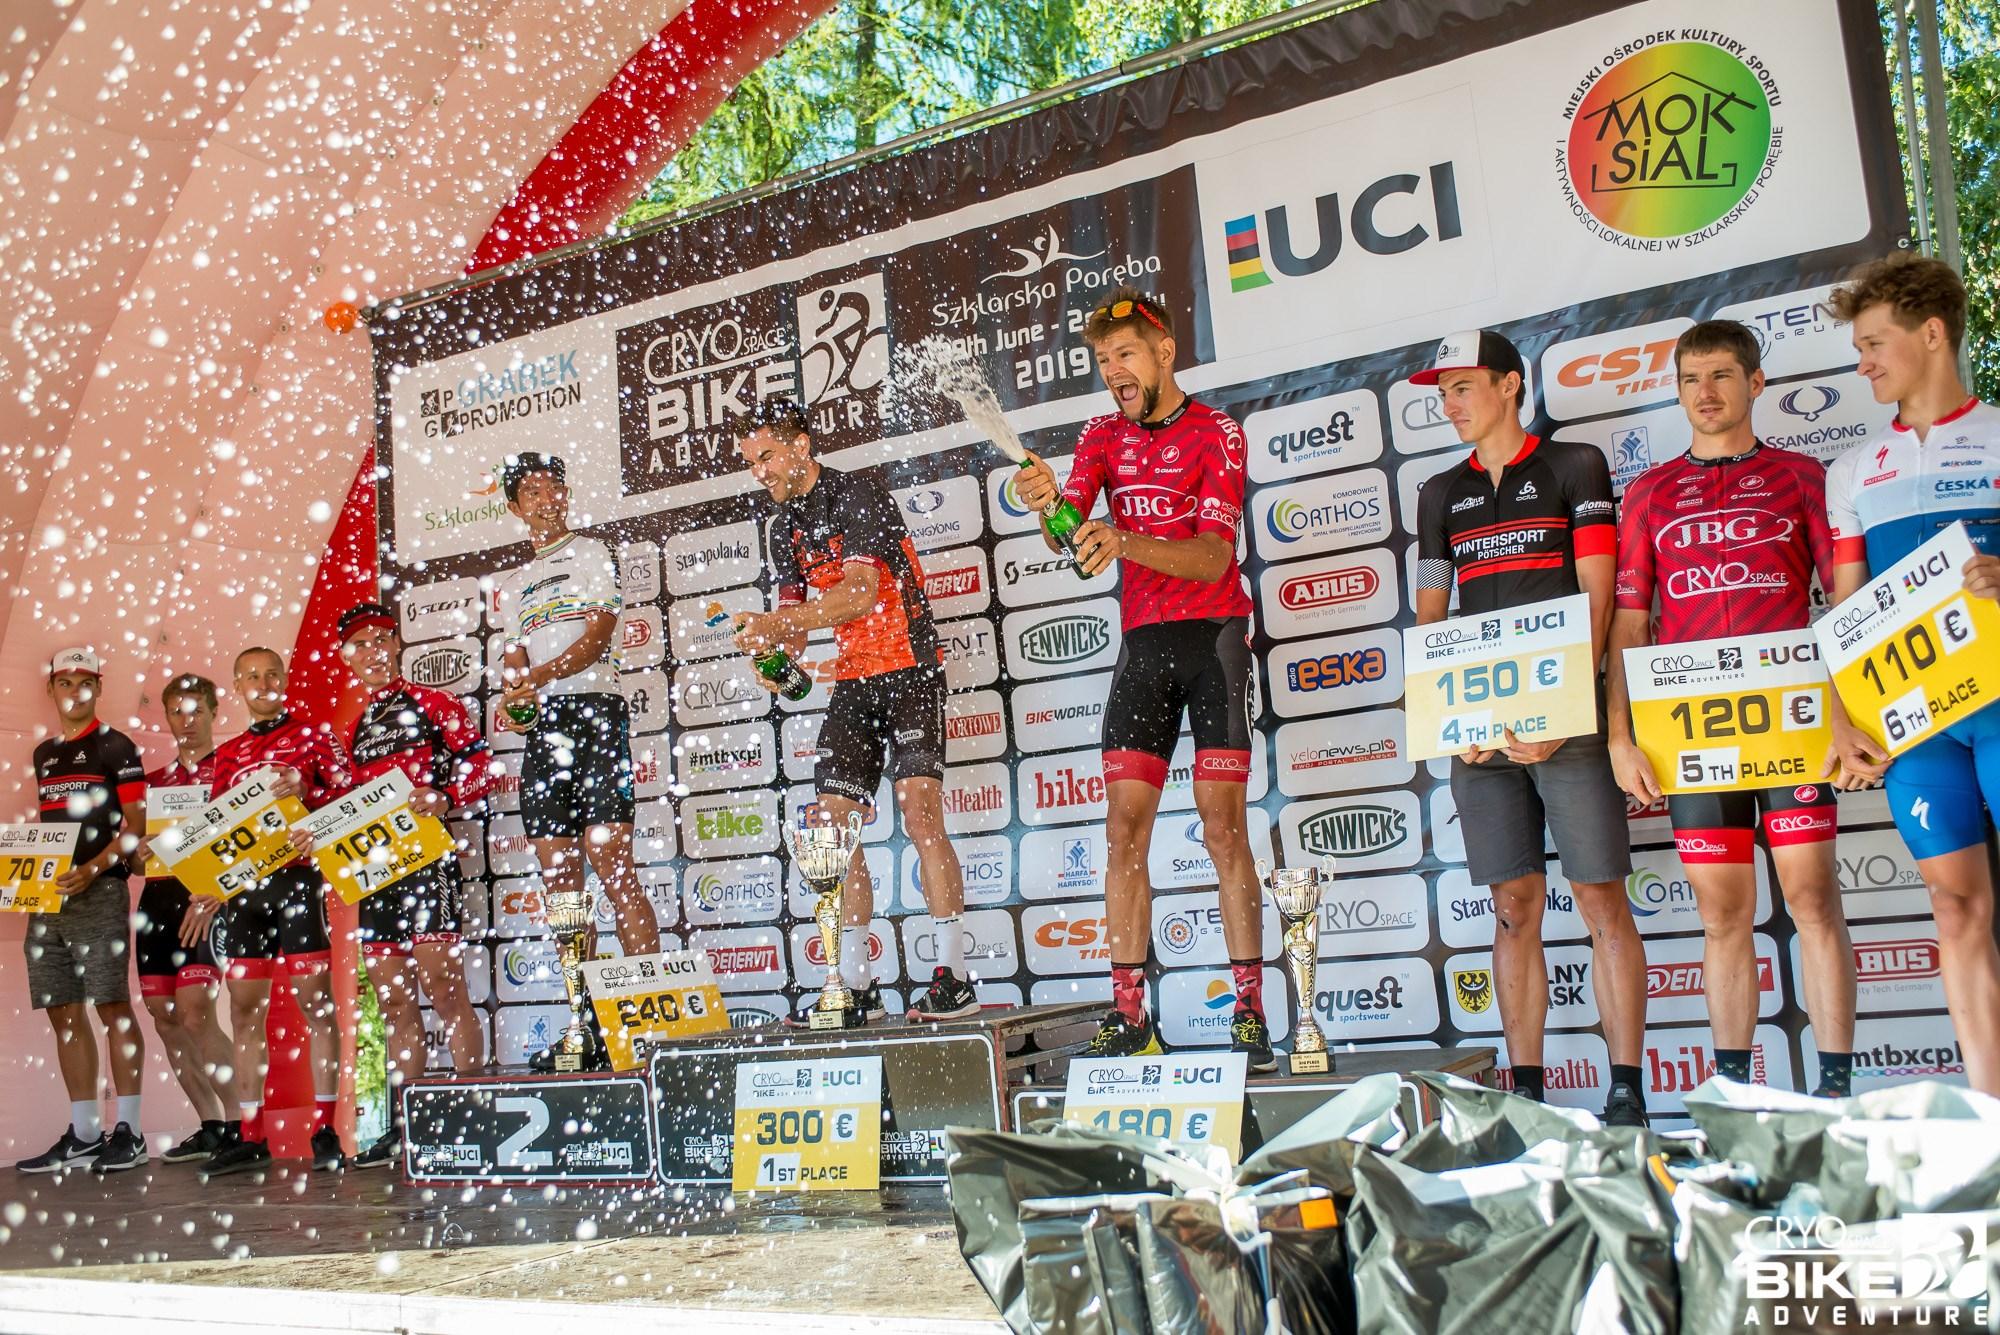 Martin Gluth wygrywa Cryospace Bike Adventure. Yamamoto i Halejak na podium